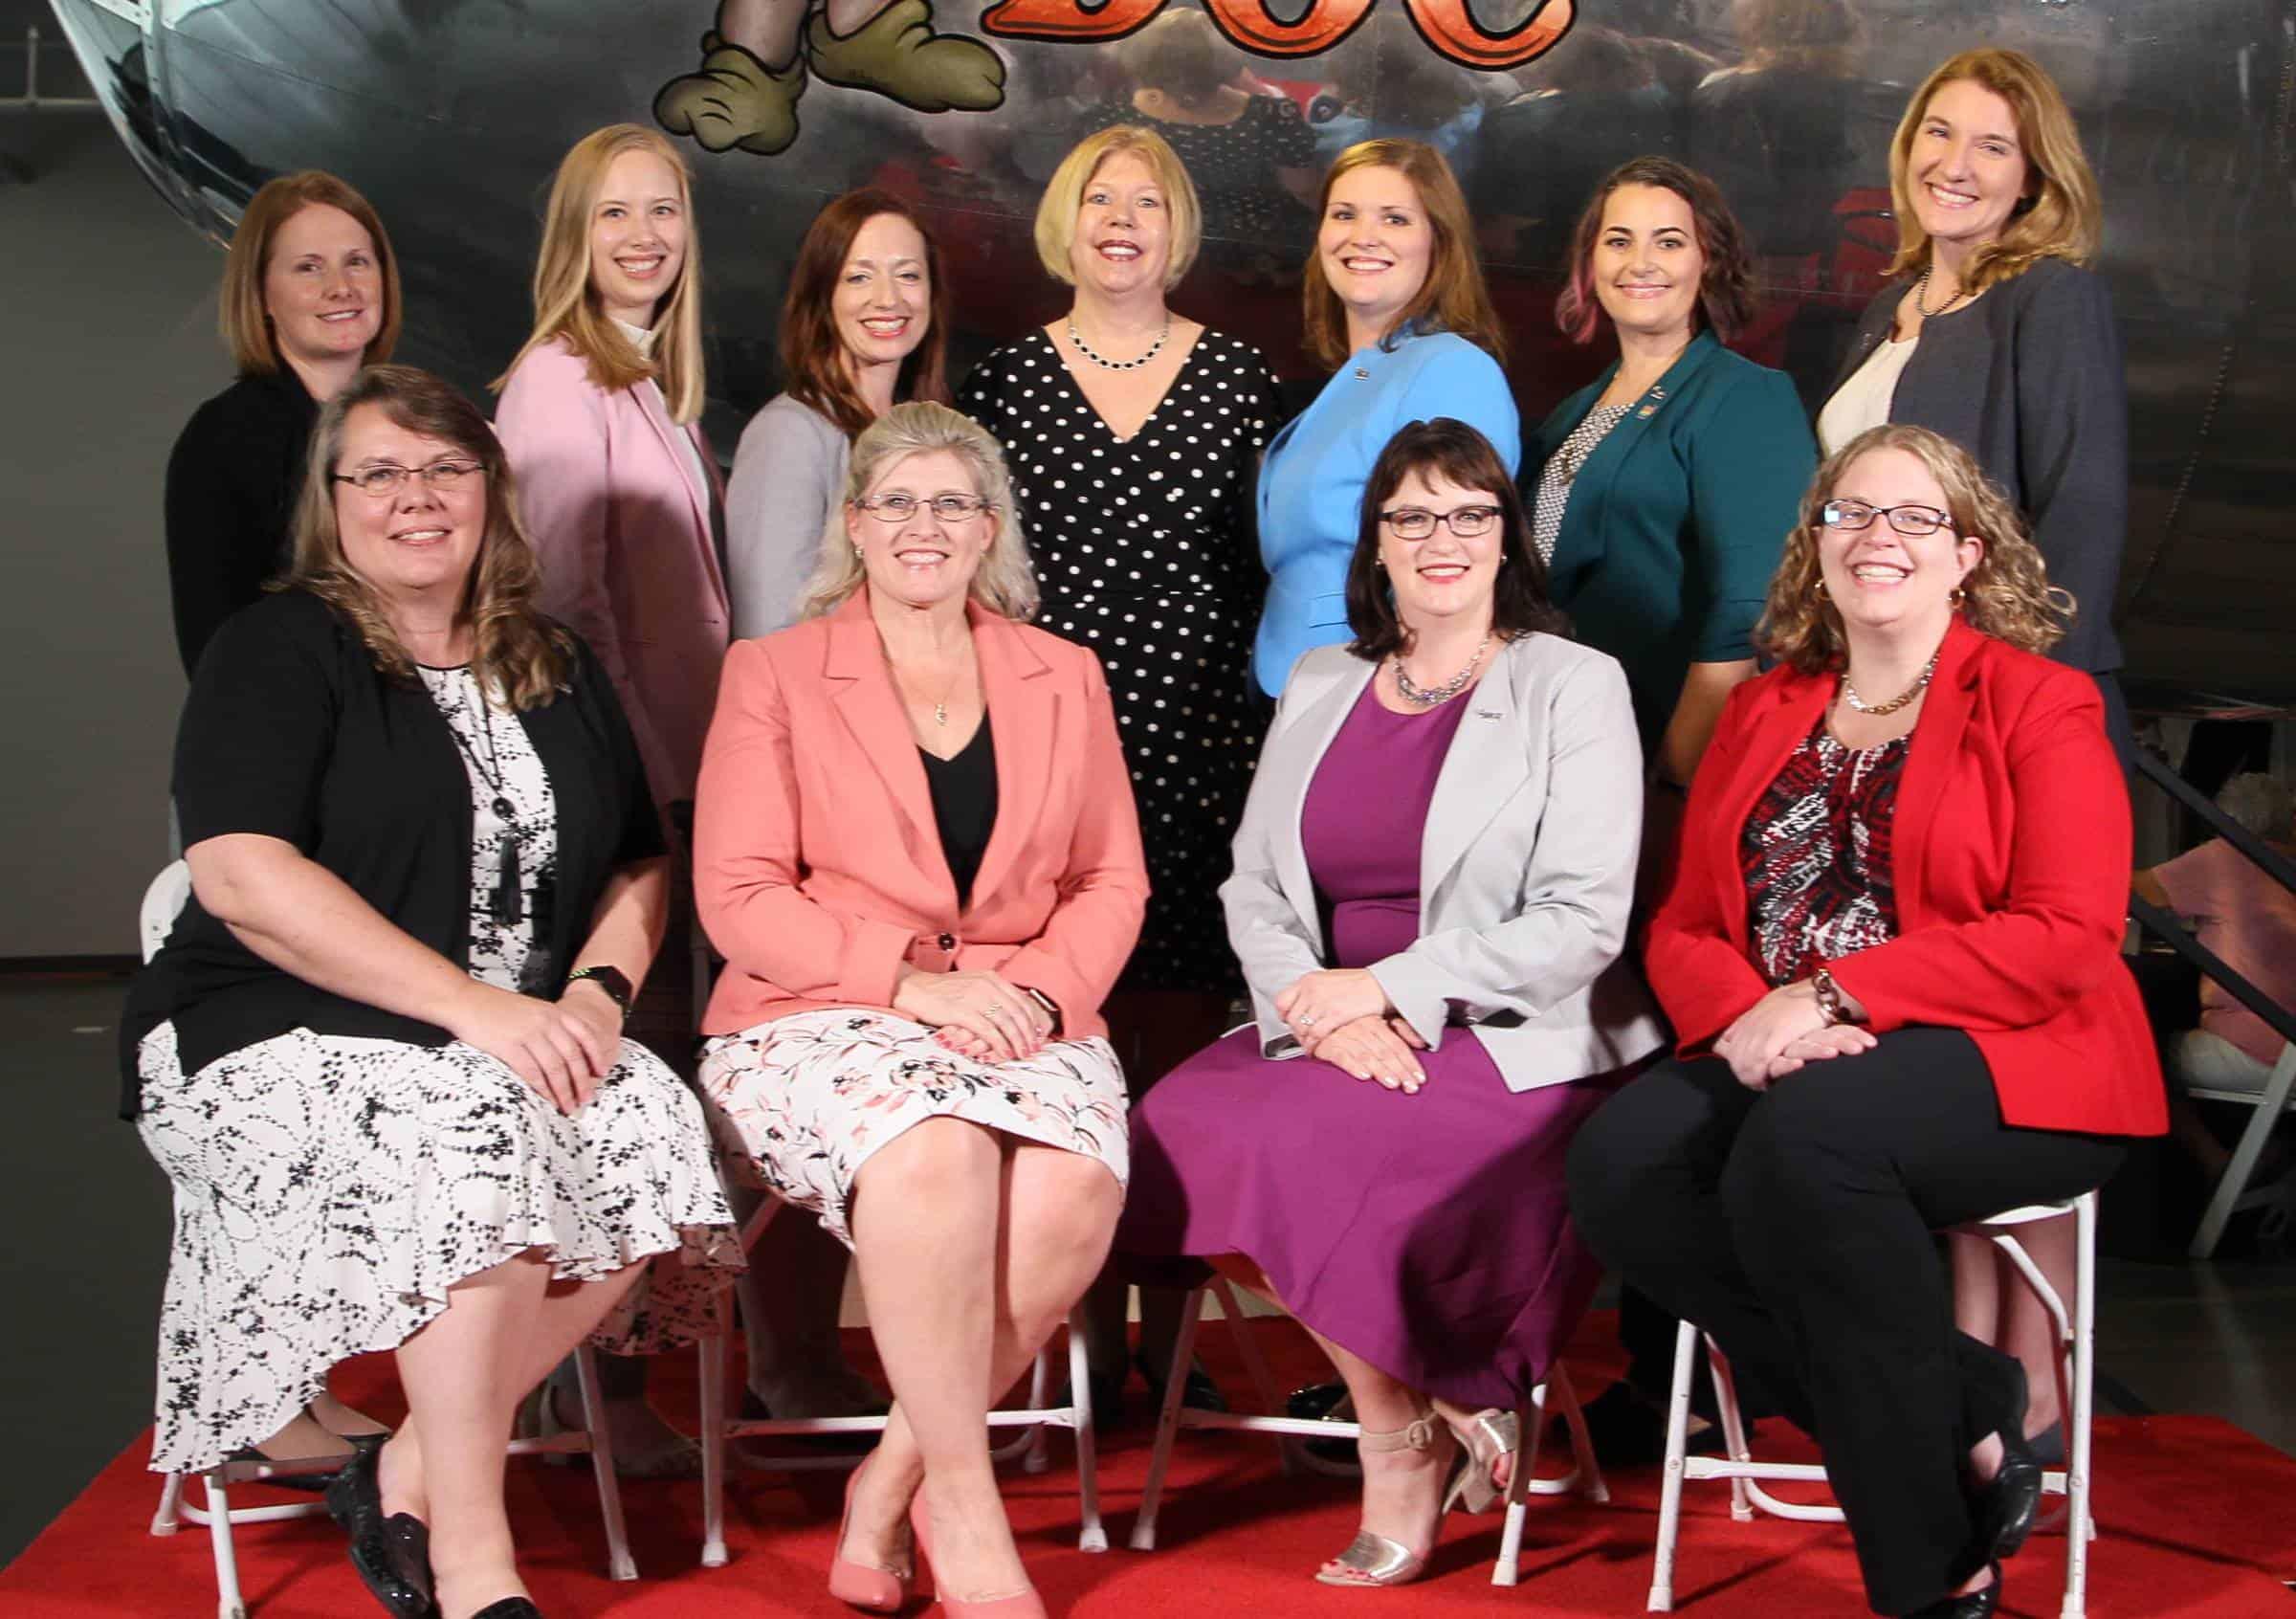 Swe Welcomes Fy20 Board Of Directors